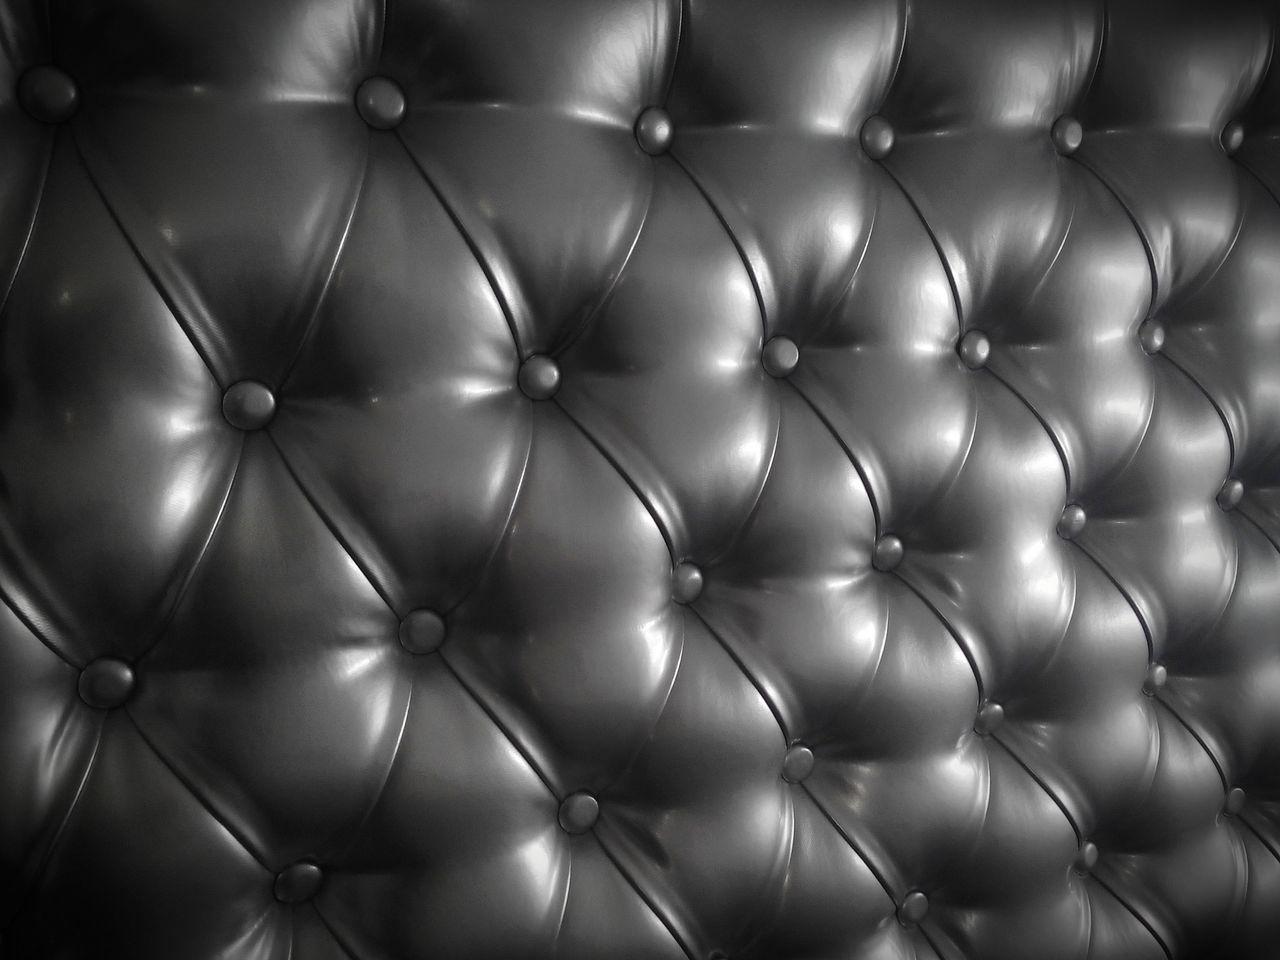 Getting Inspired Blackandwhite Monocrome Decoration Silver  Black & White Black And White Monocromatic Decorationideas Decoracion Getting Creative Plata